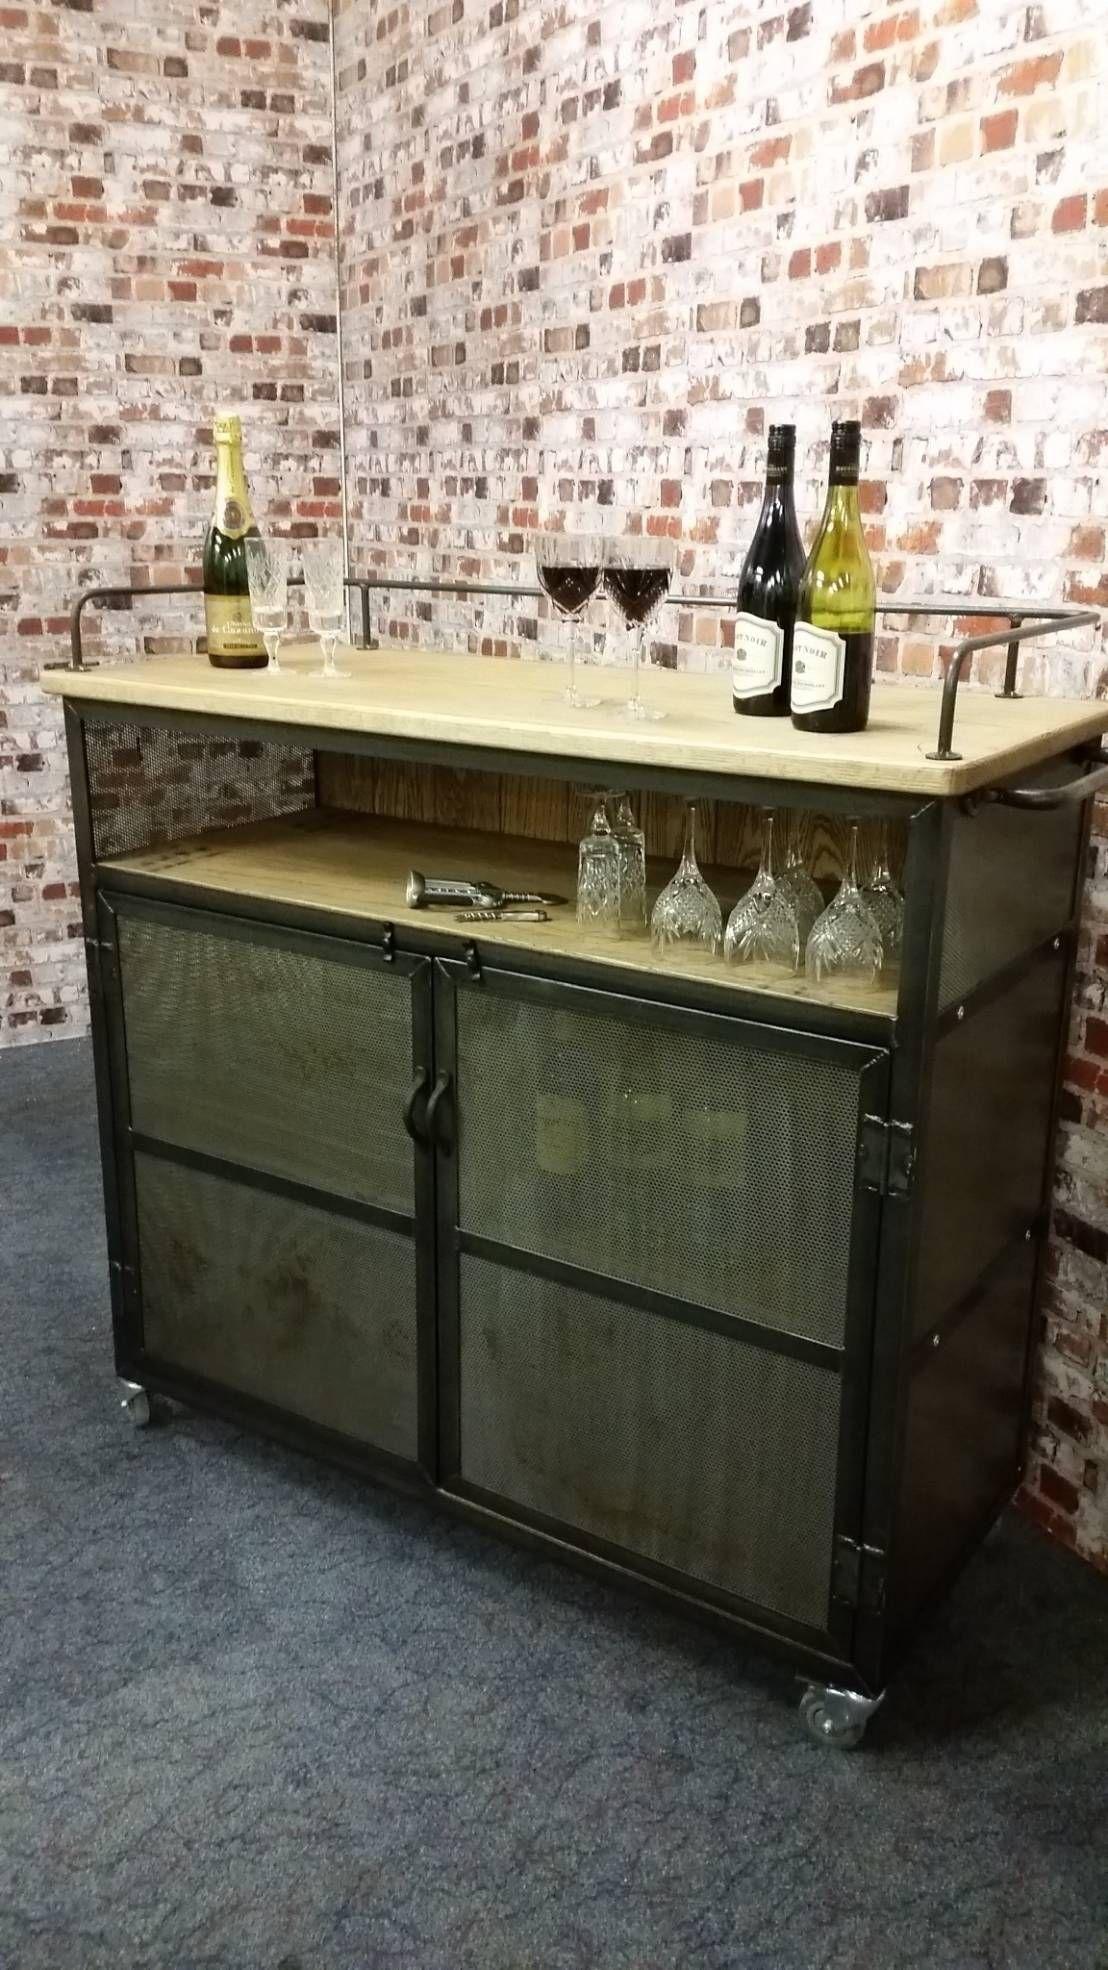 Un peque o placer en casa 10 muebles bar de inspiraci n - Muebles para bar ...